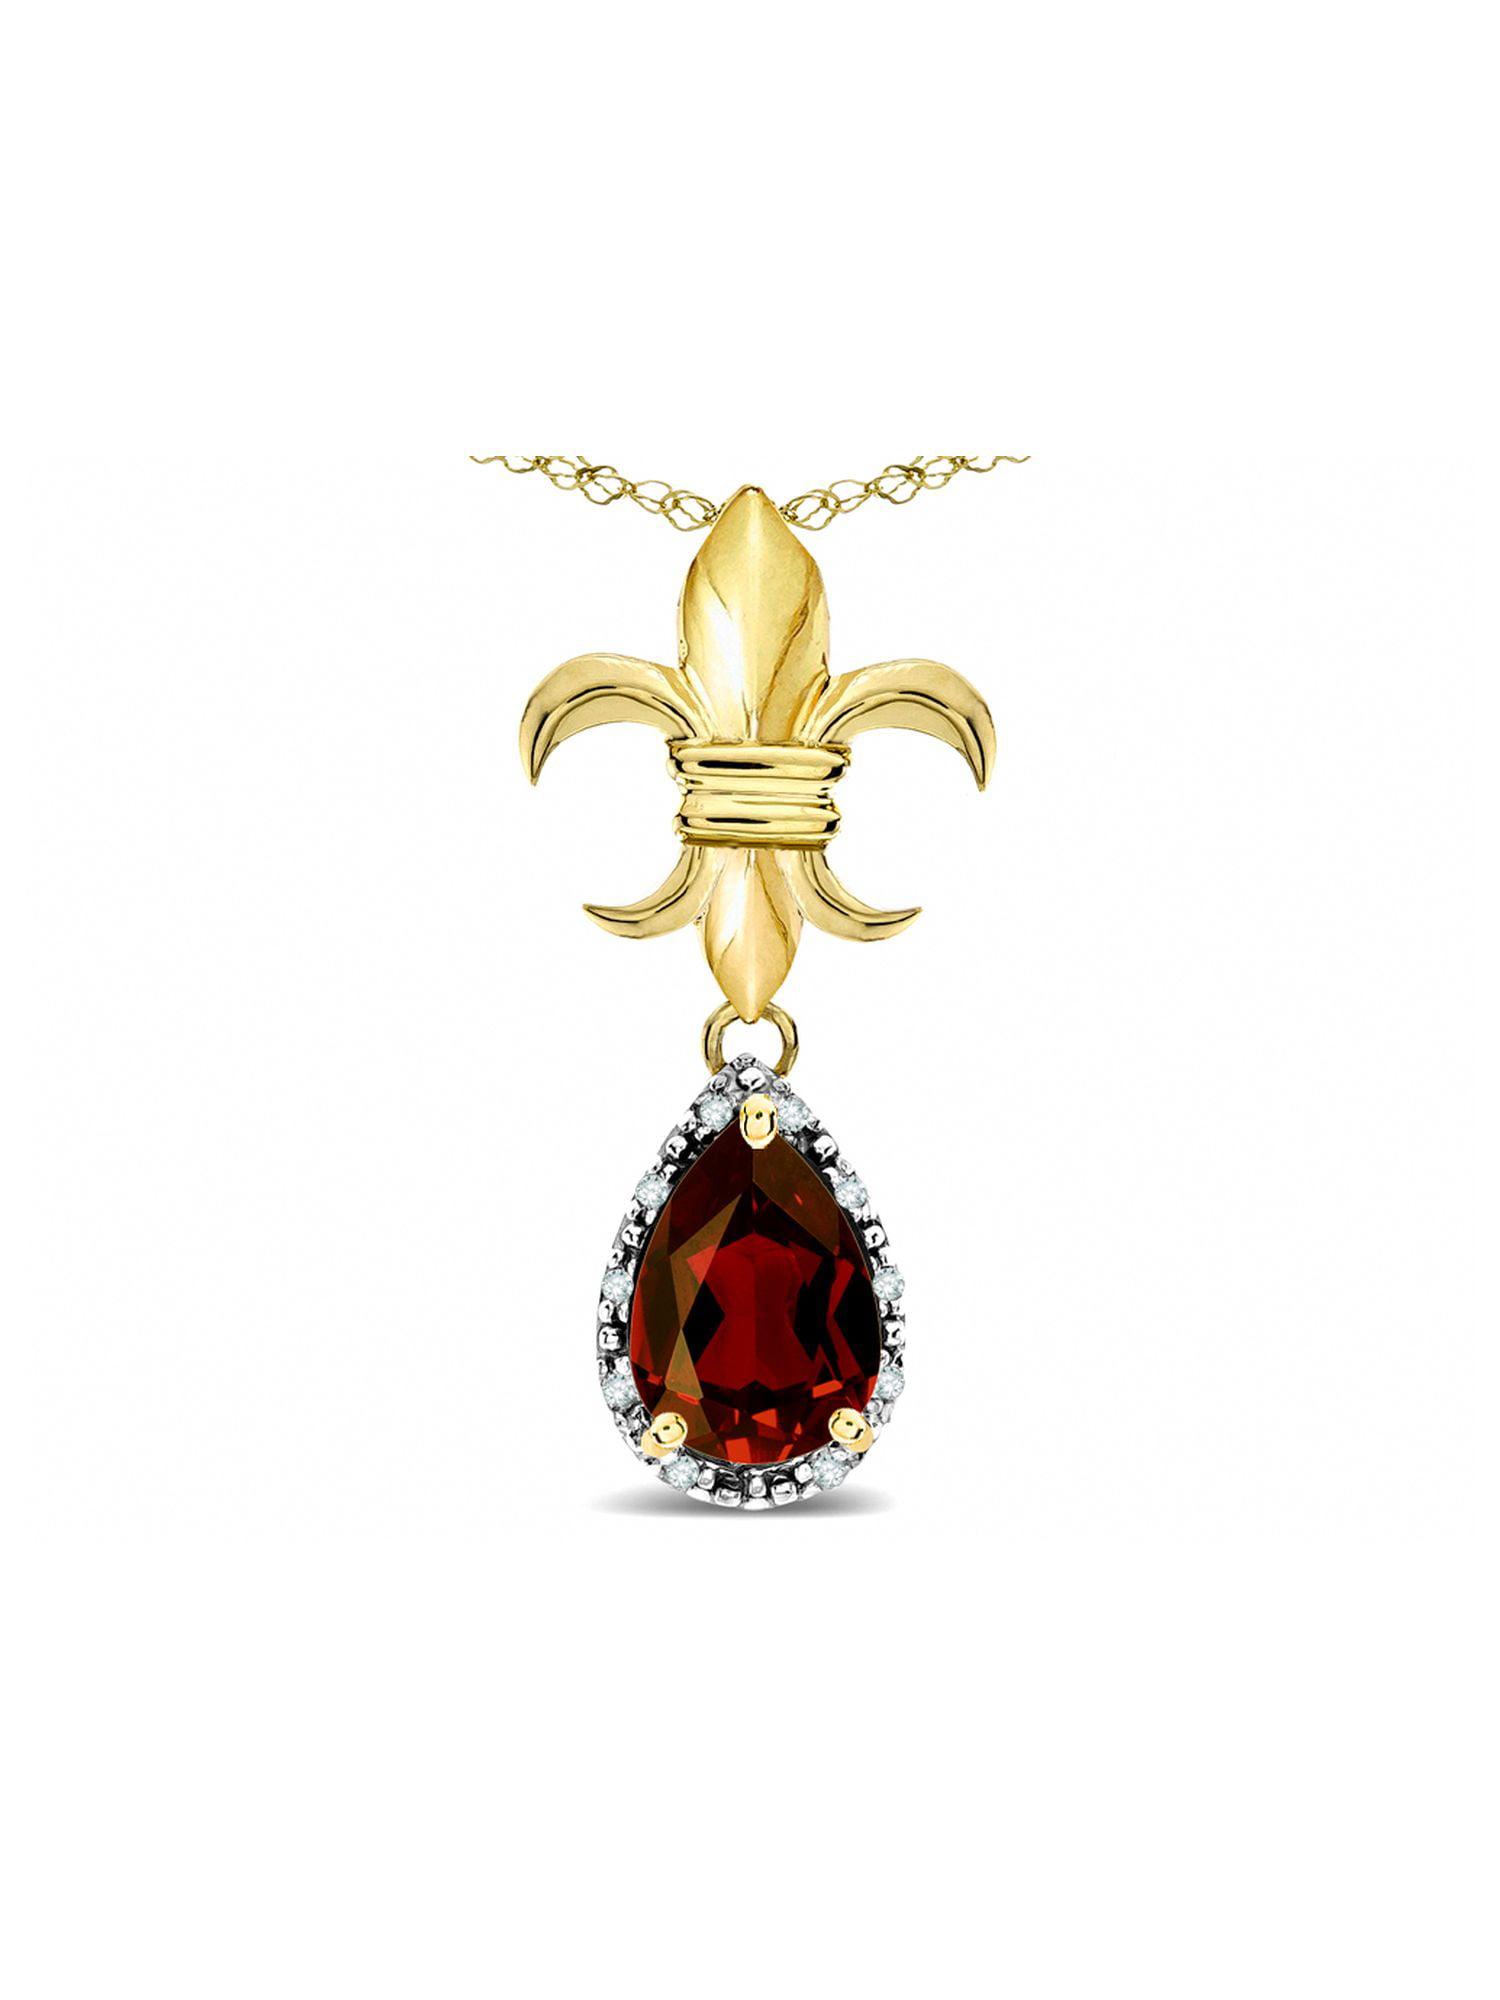 Star K Pear Shape 8x6mm Genuine Garnet Fleur De Lis Pendant Necklace 14k Yellow Gold by Star K